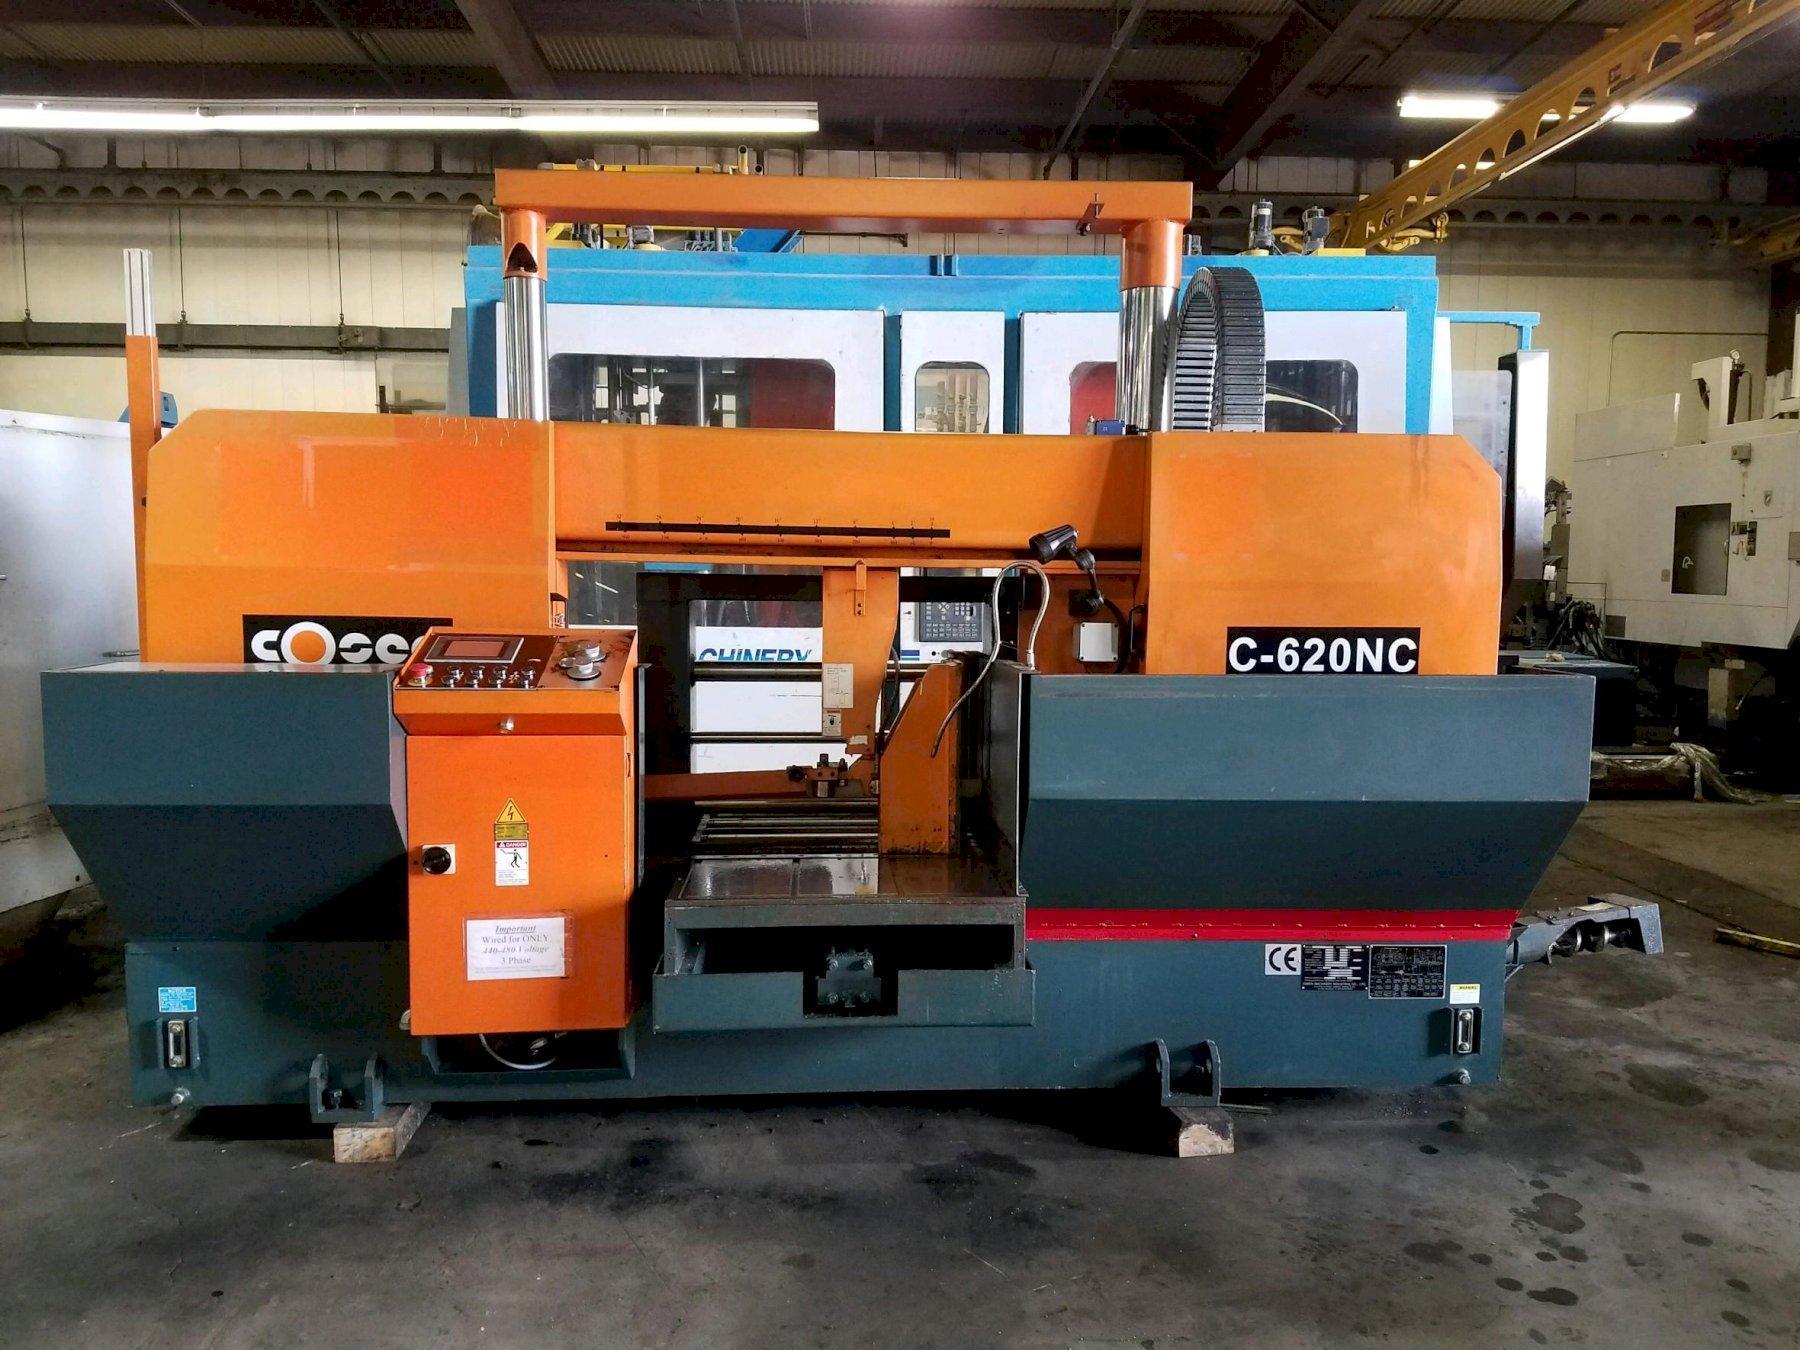 Cosen C-920NC Saw